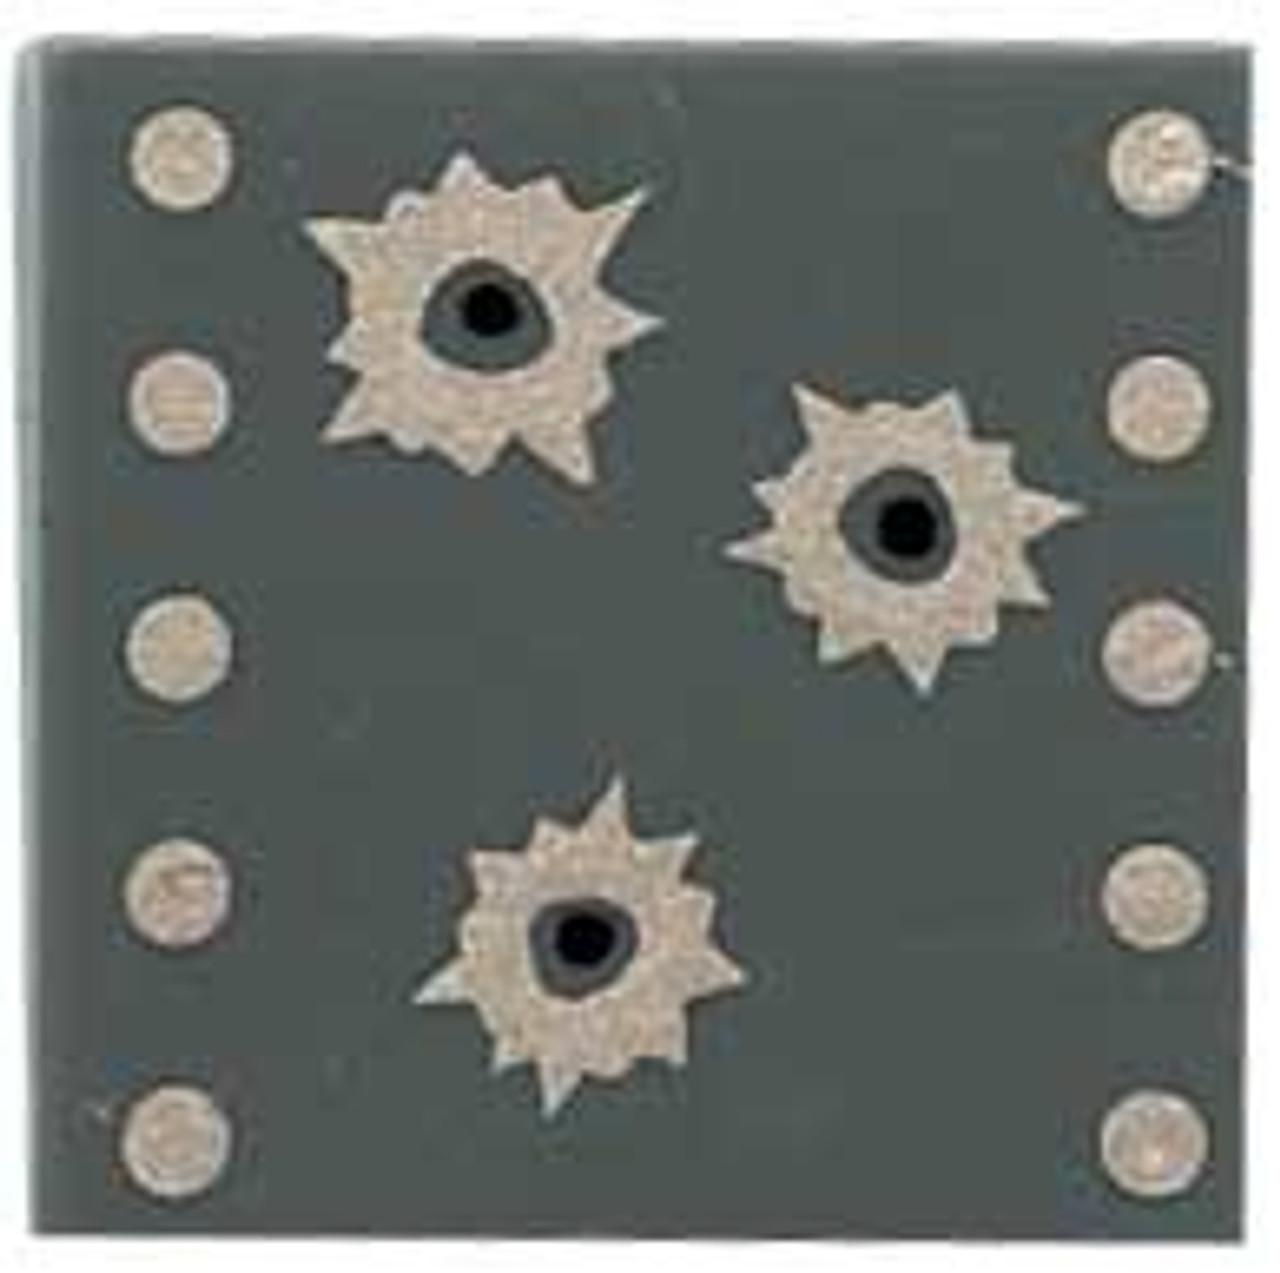 Citizen Brick Custom Painted Bullet Holes Tile Loose Accessory [Dark Gray]